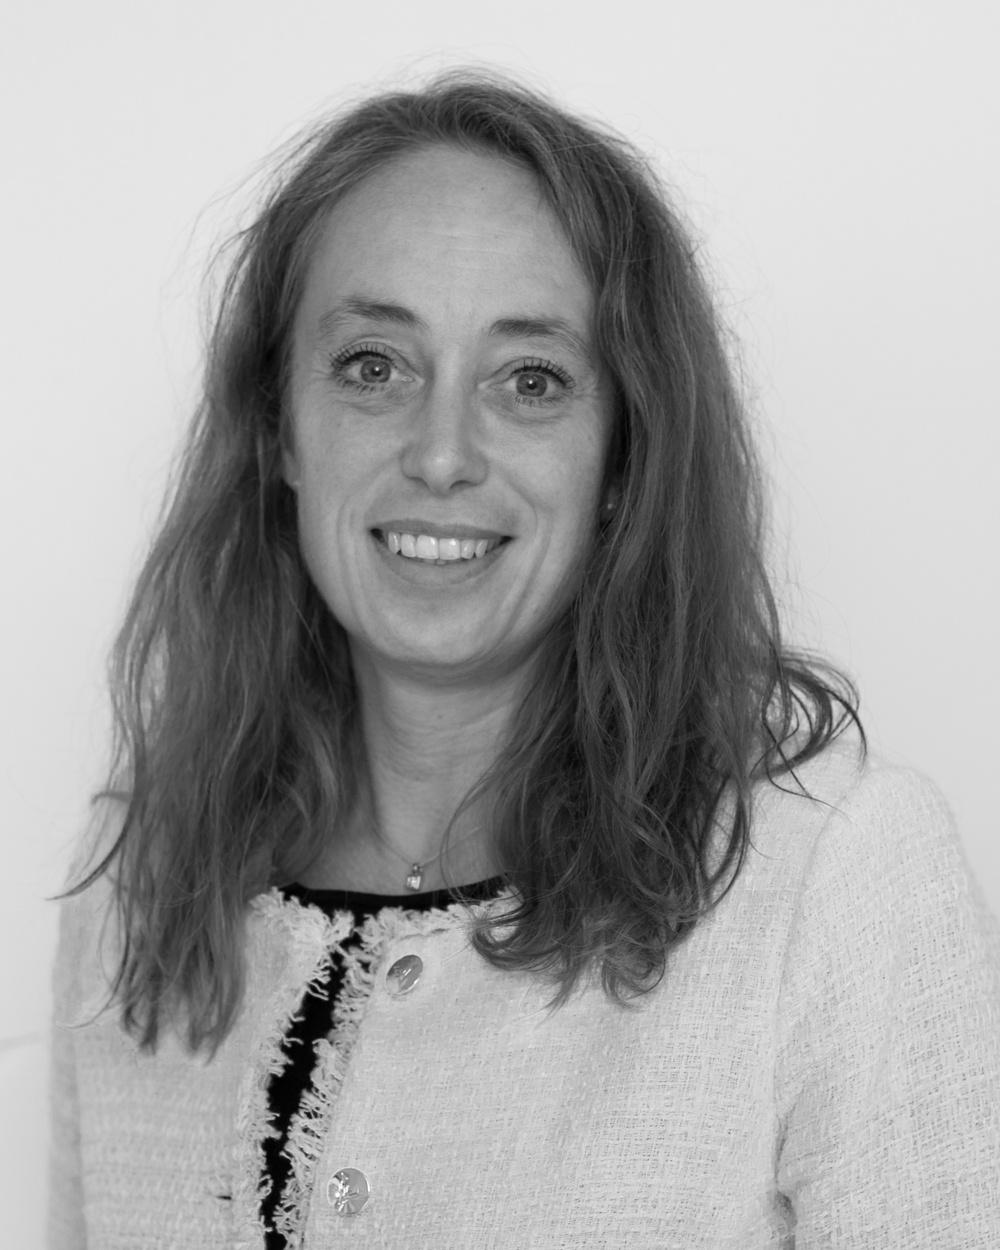 Christine Stadling